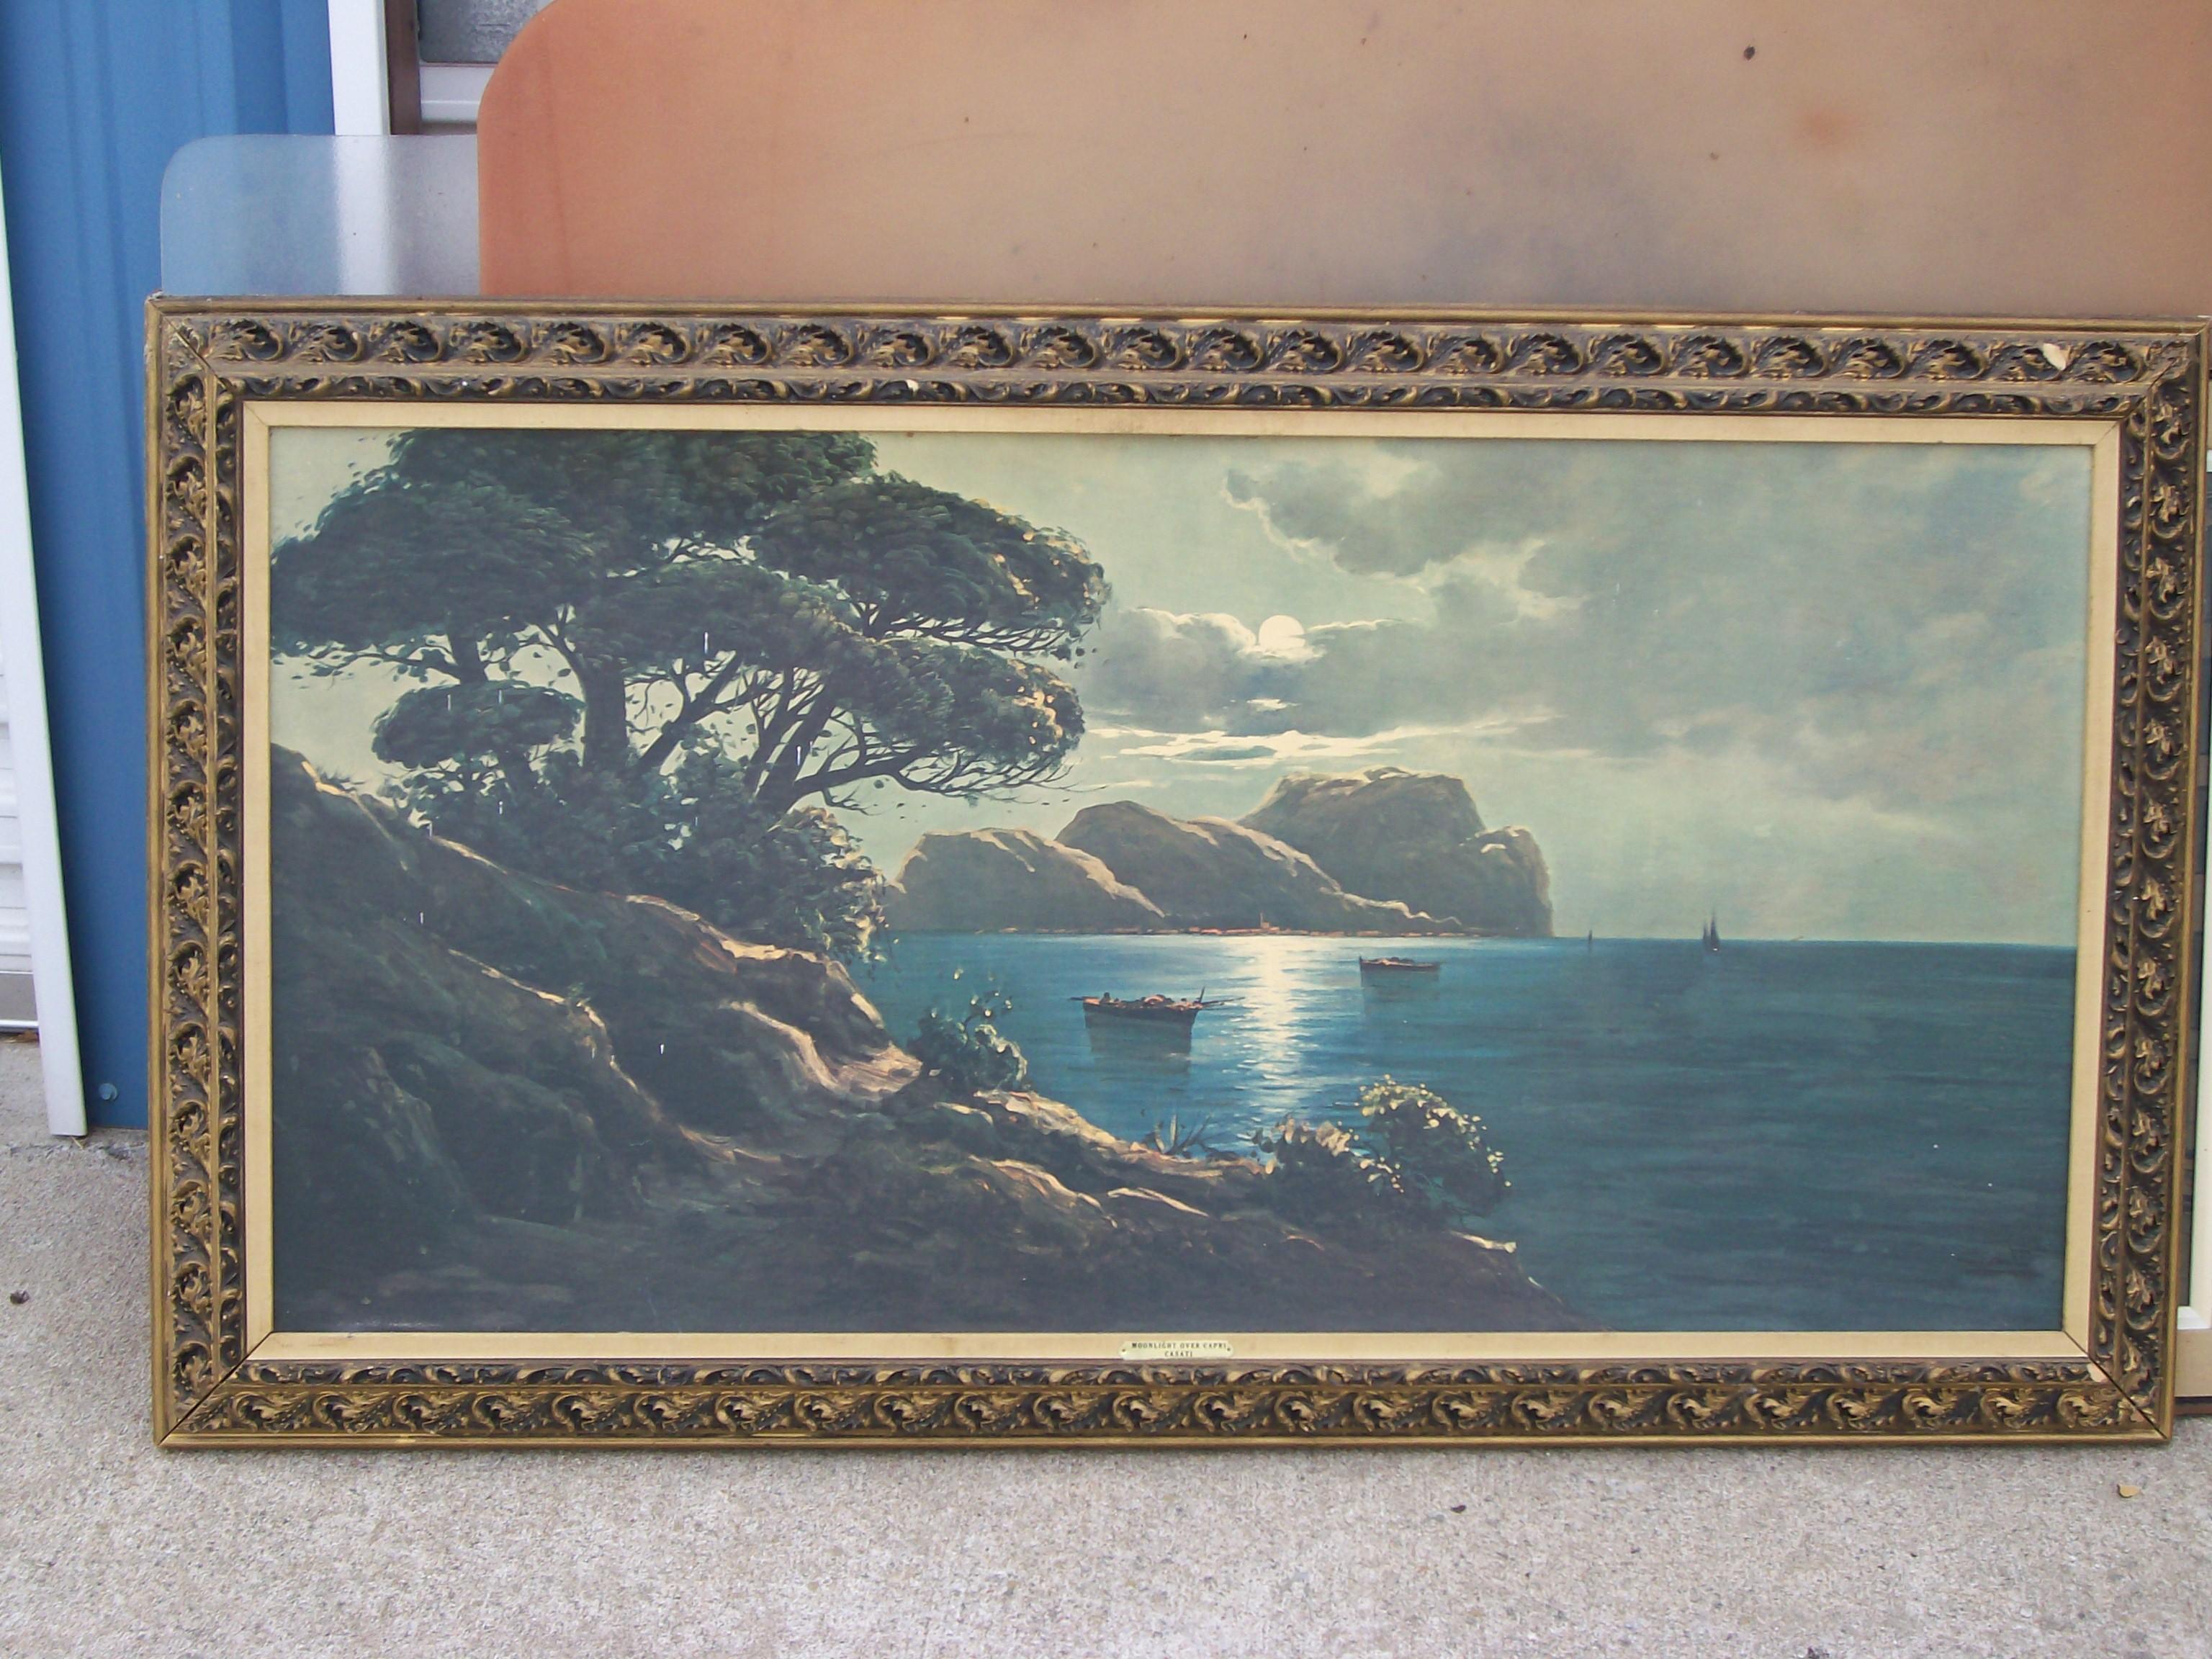 Moonlight Over Capri antique appraisal | InstAppraisal